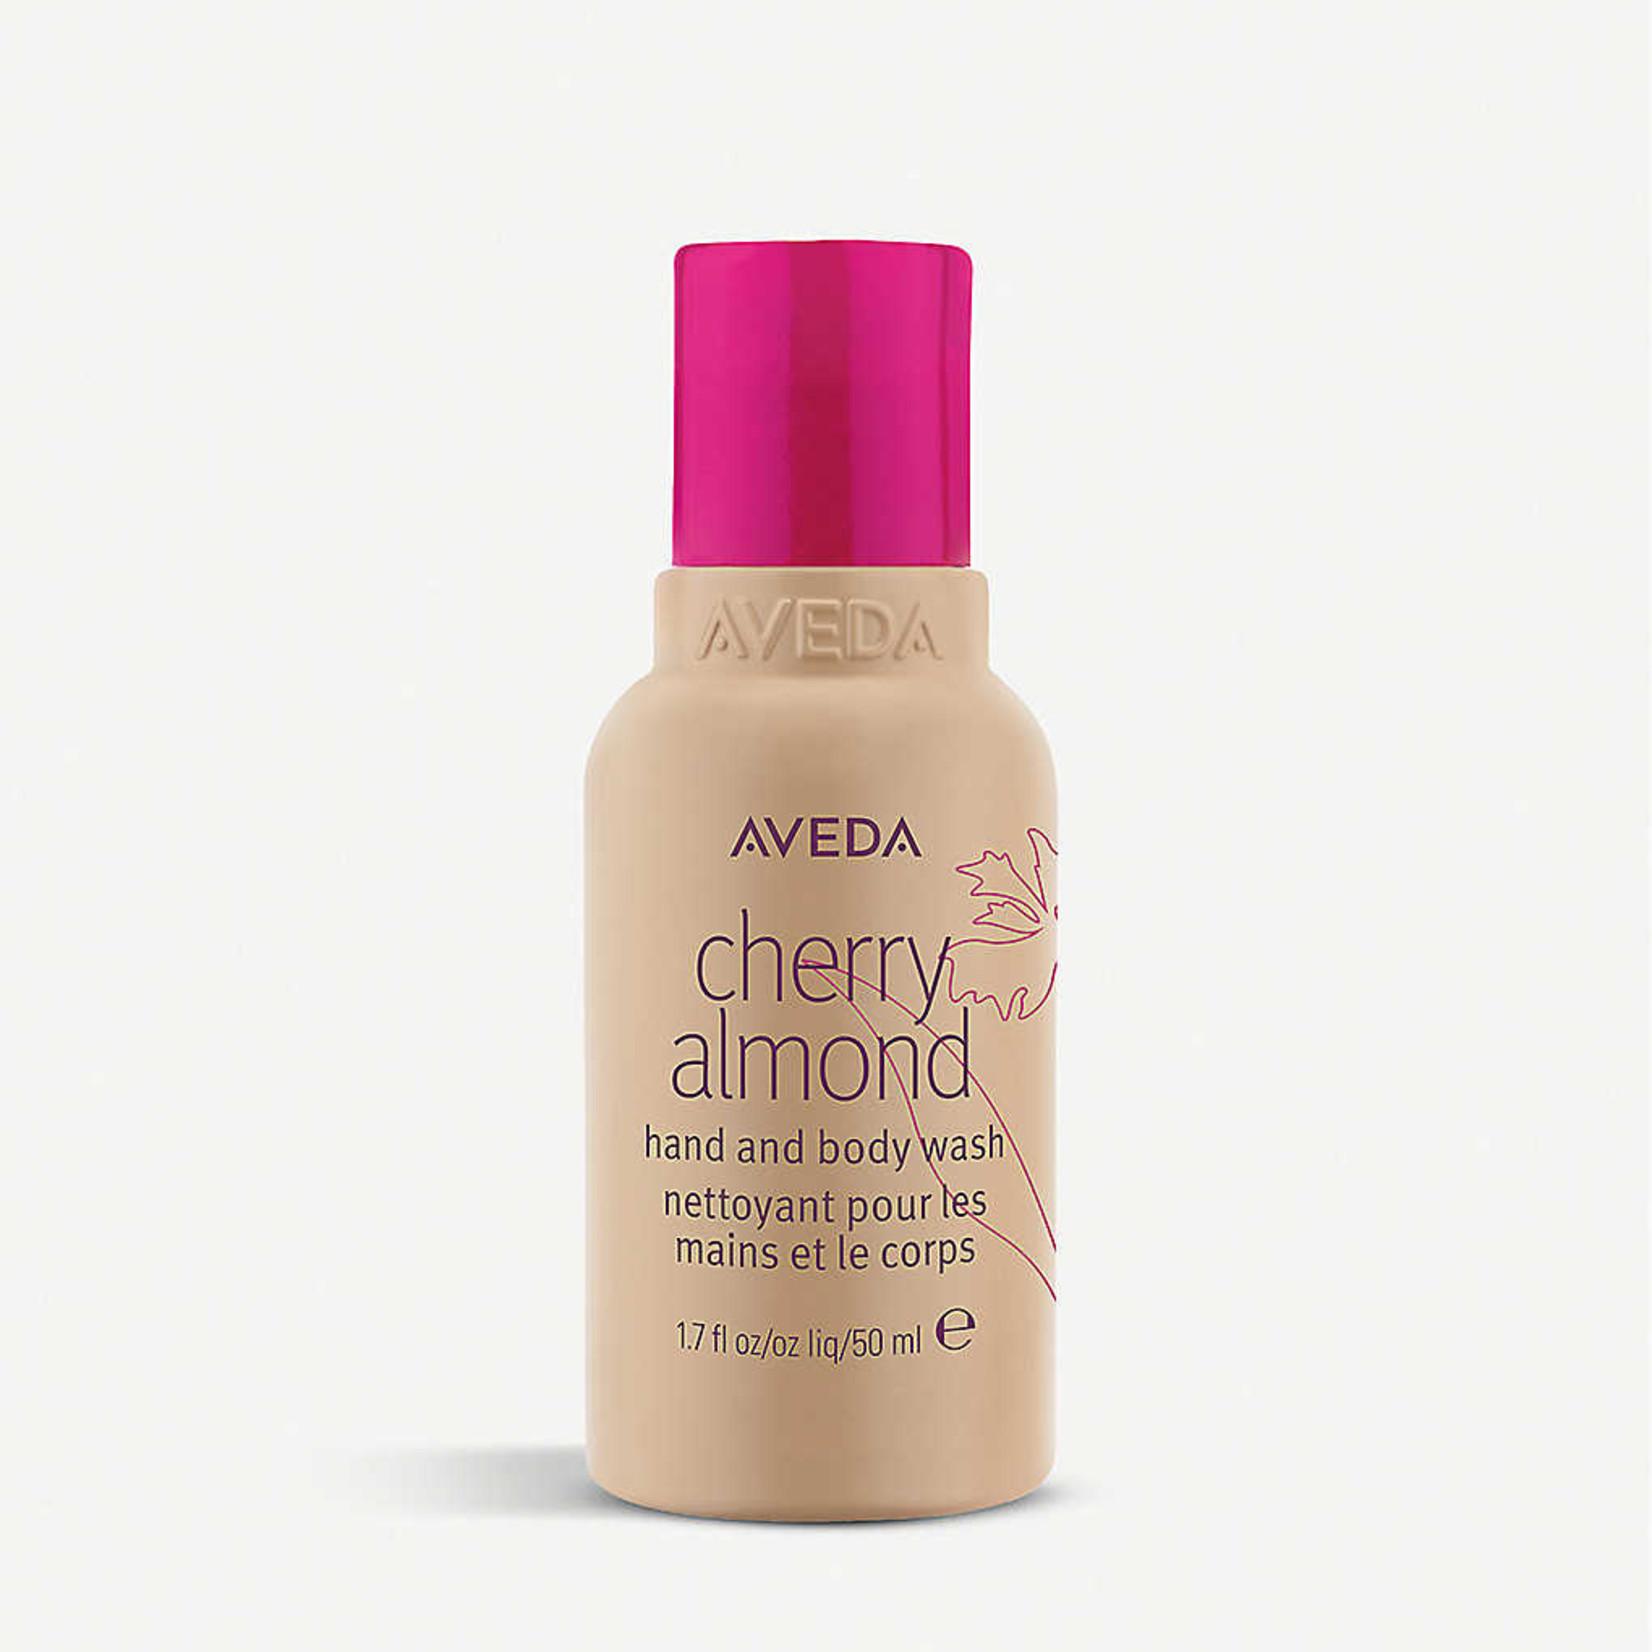 AVEDA Cherry Almond Hand and Body Wash